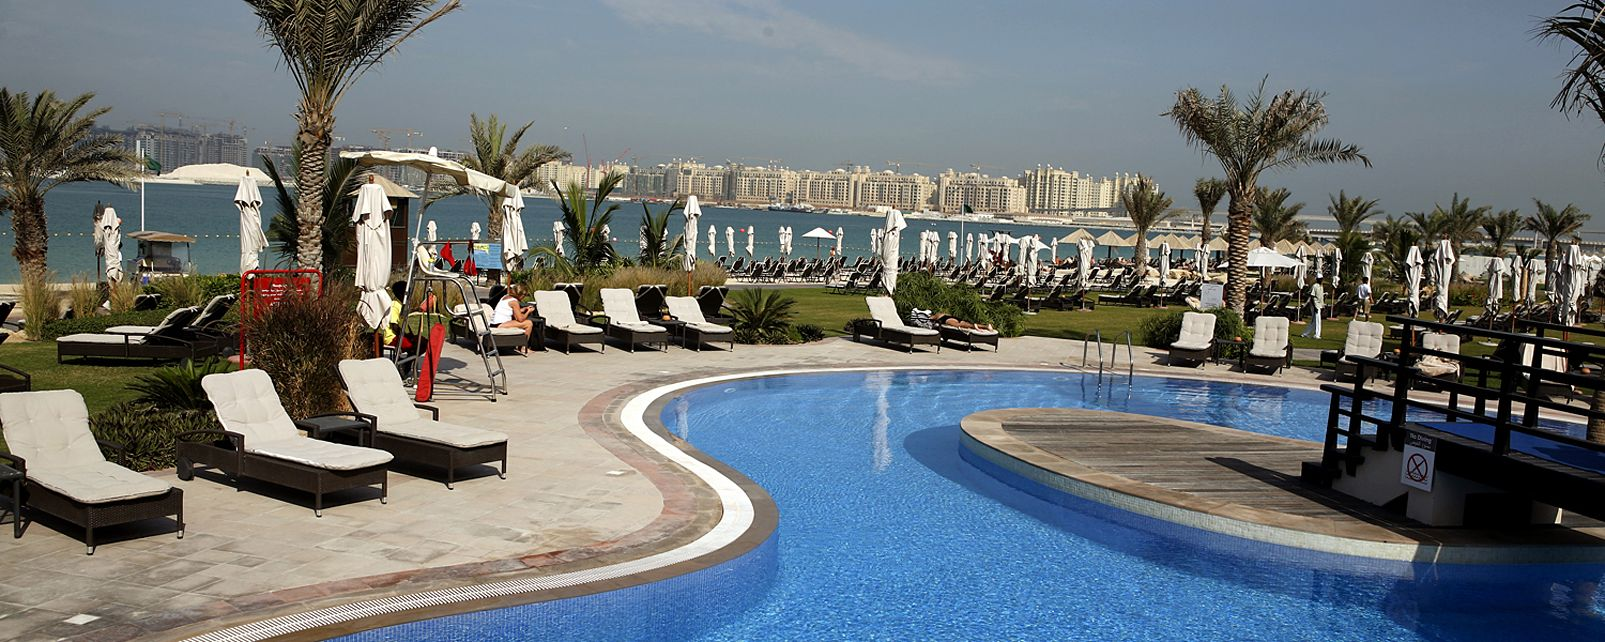 Hotel The Westin Dubai Mina Seyahi Beach Resort amp Marina